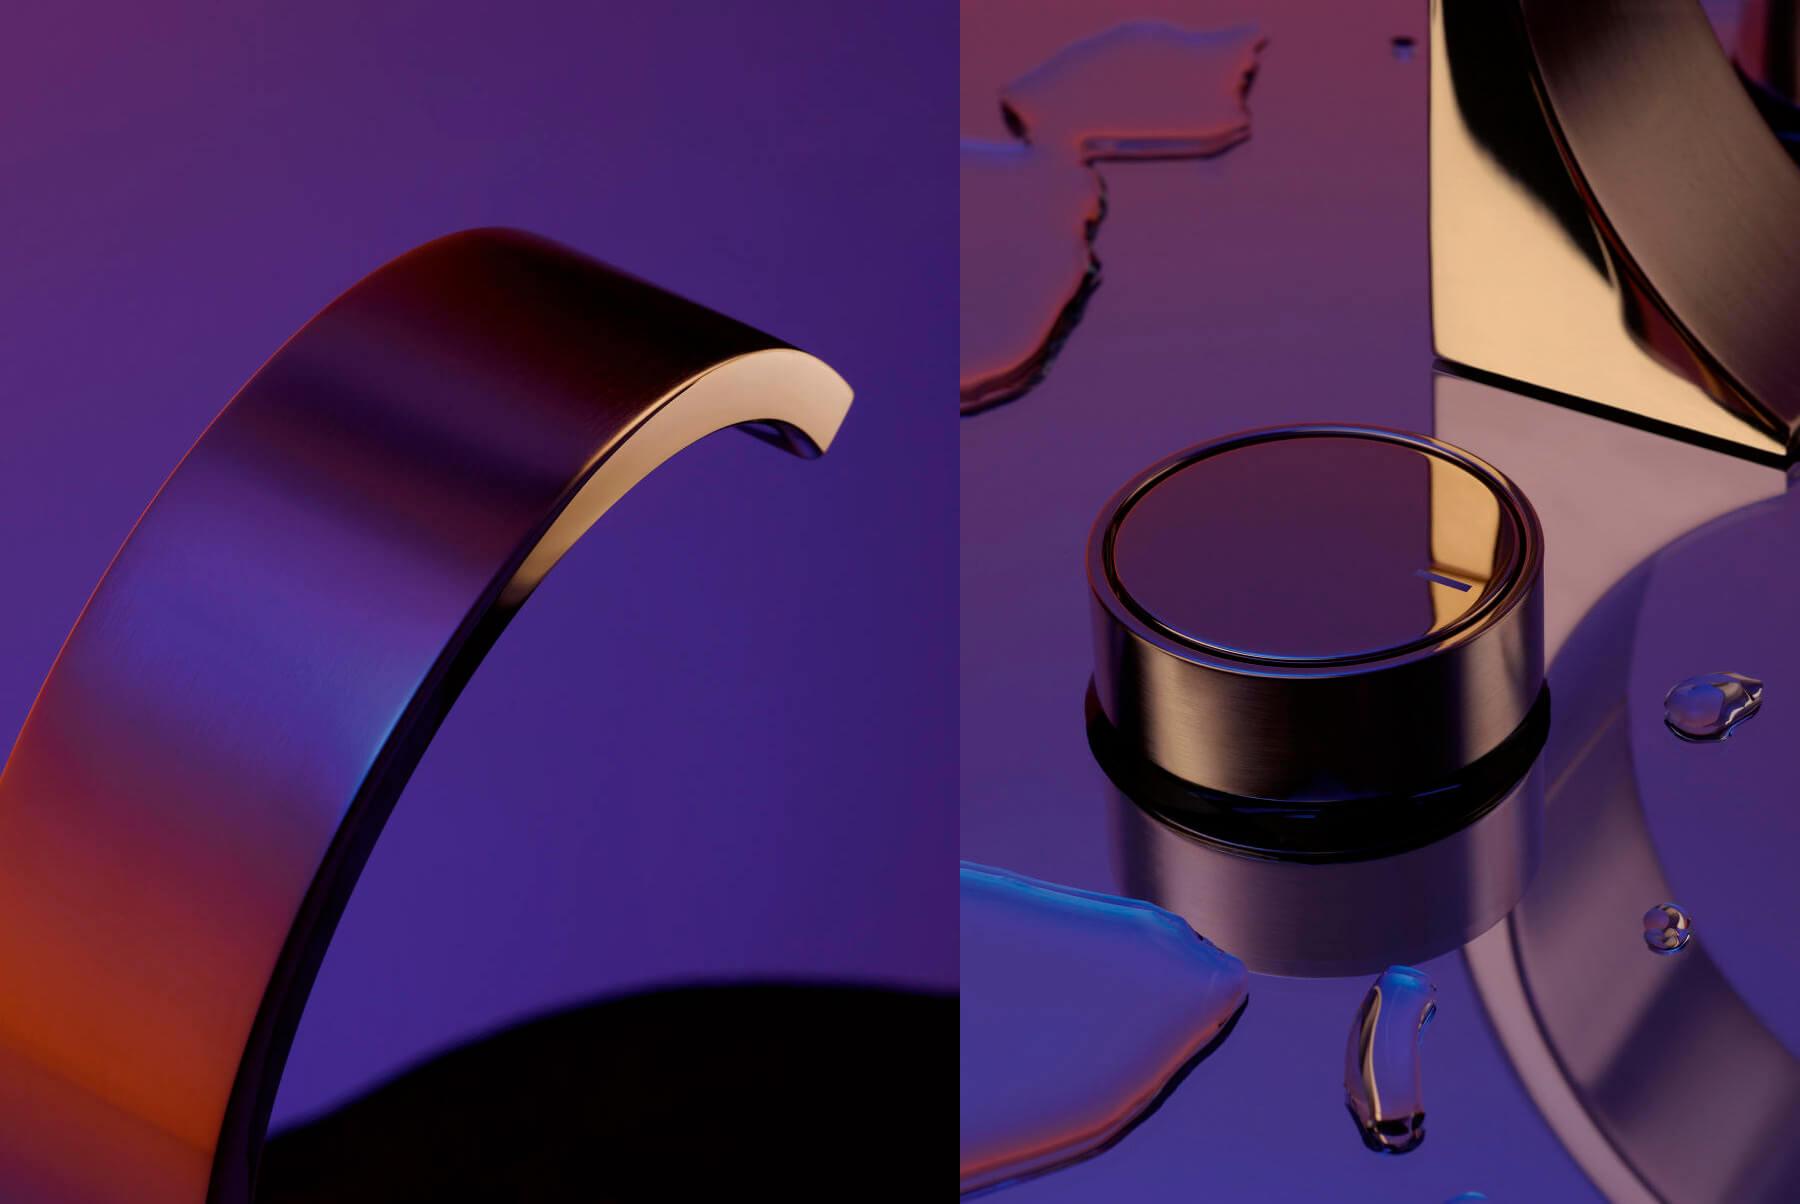 Brassware-DORNBRACHT-CYO-INSET-3-1800x1204